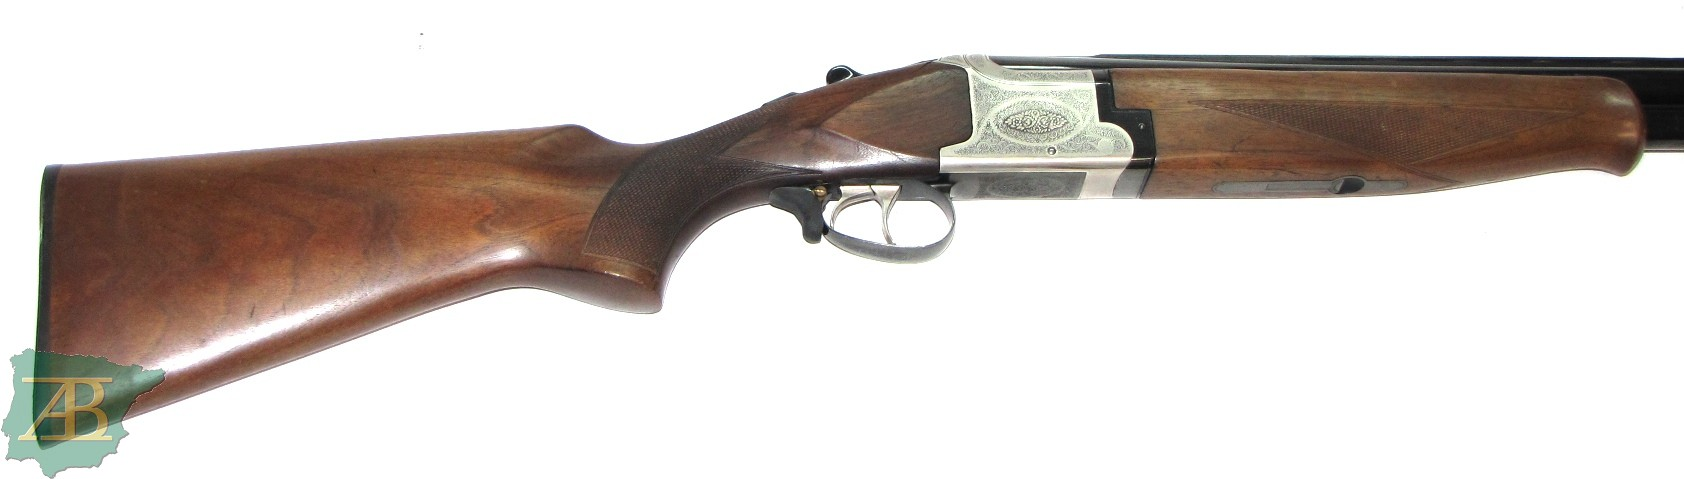 Escopeta superpuesta de caza LAURONA Ref 5743-armeriaiberica-2